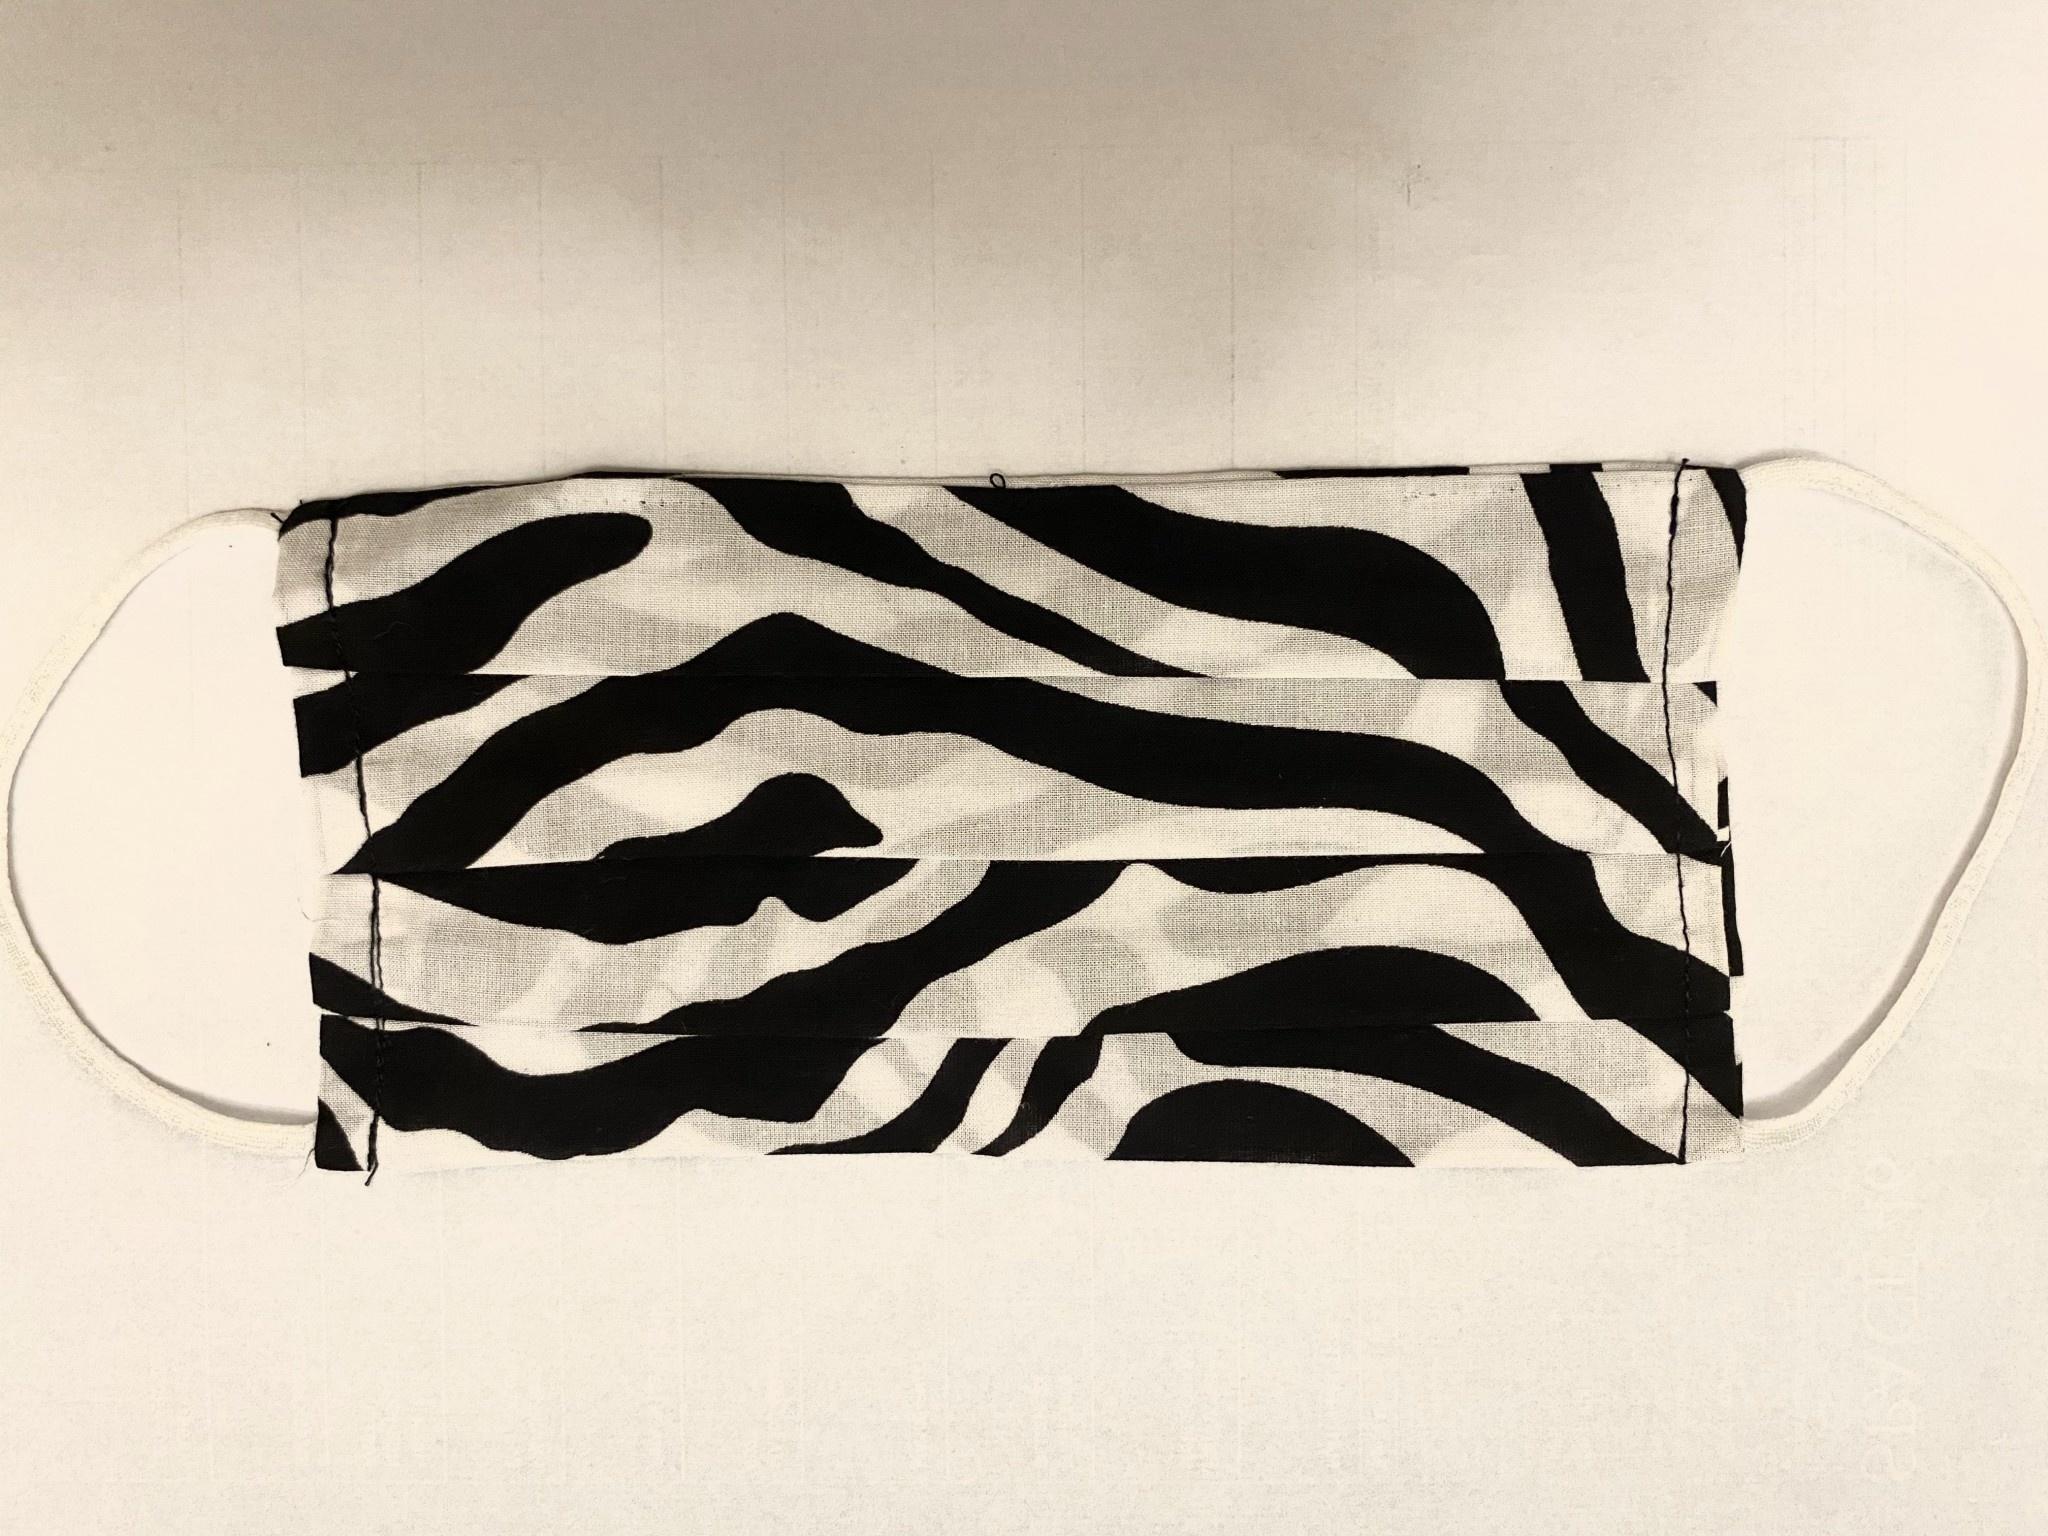 Black Zebra Face Mask